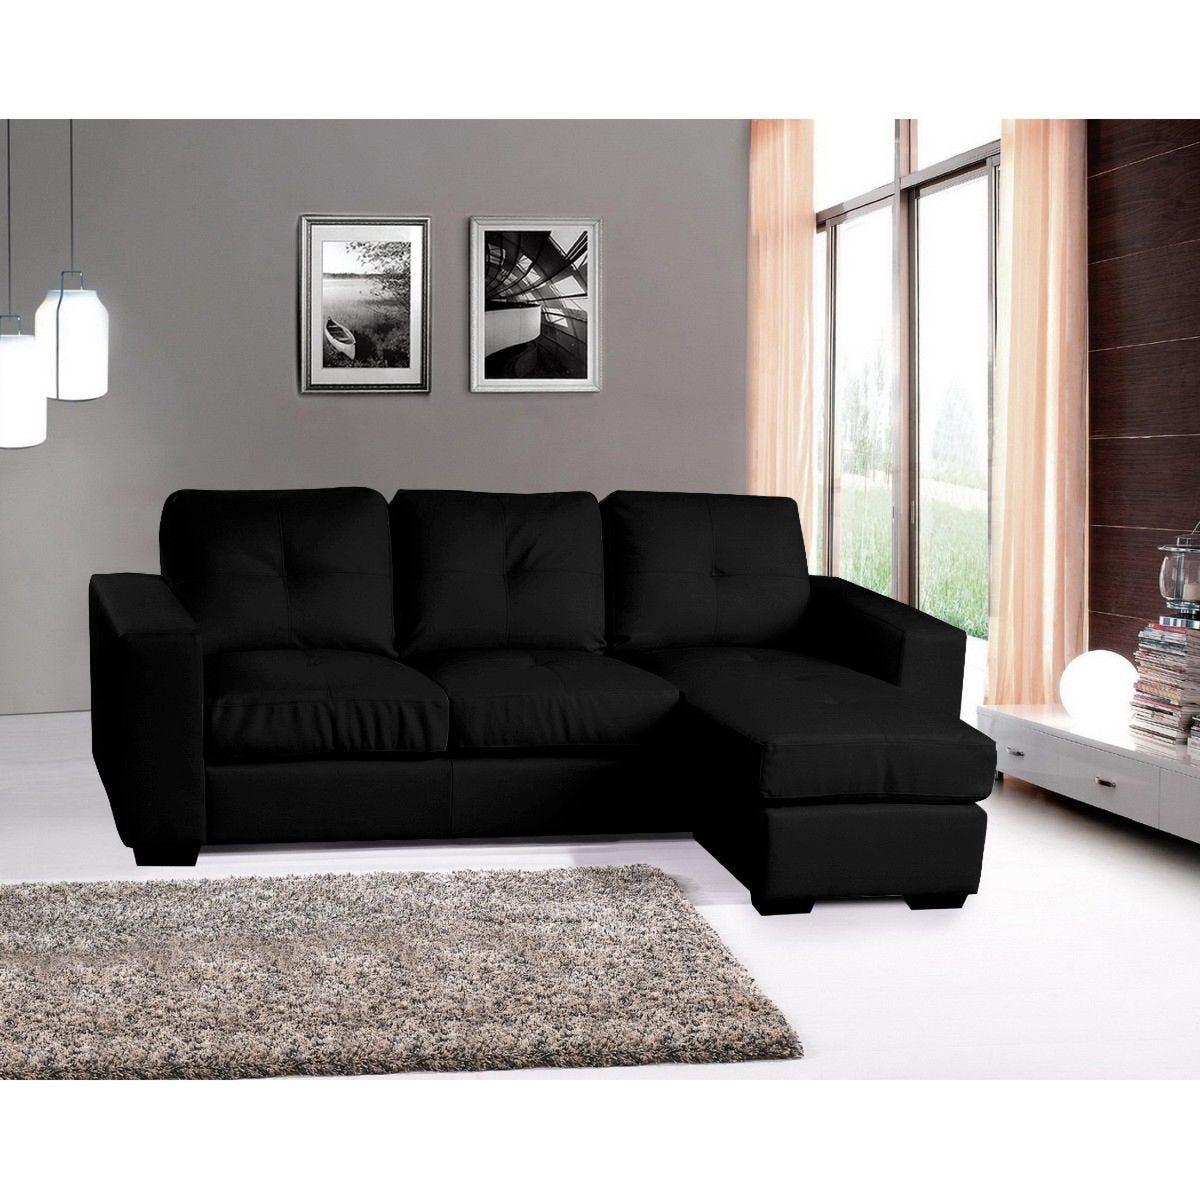 Darwen Bonded Faux Leather Corner Chaise Sofa Black